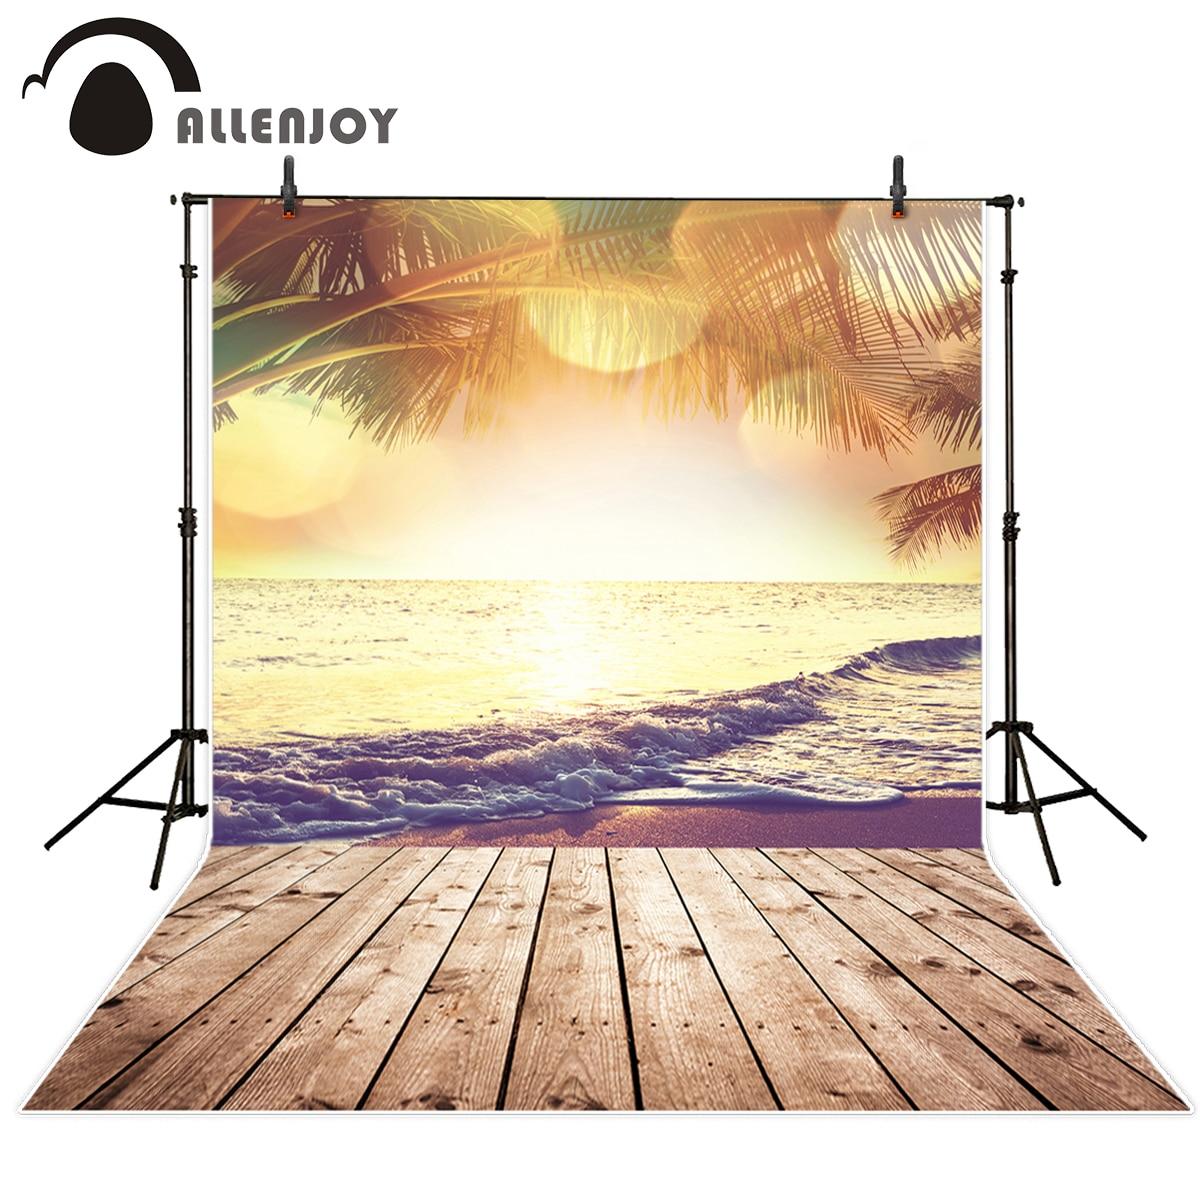 Allenjoy verano mar fondo para fotografía tipo bokeh Playa Coco árbol estético paisaje Natural fondo profesional sesión fotográfica